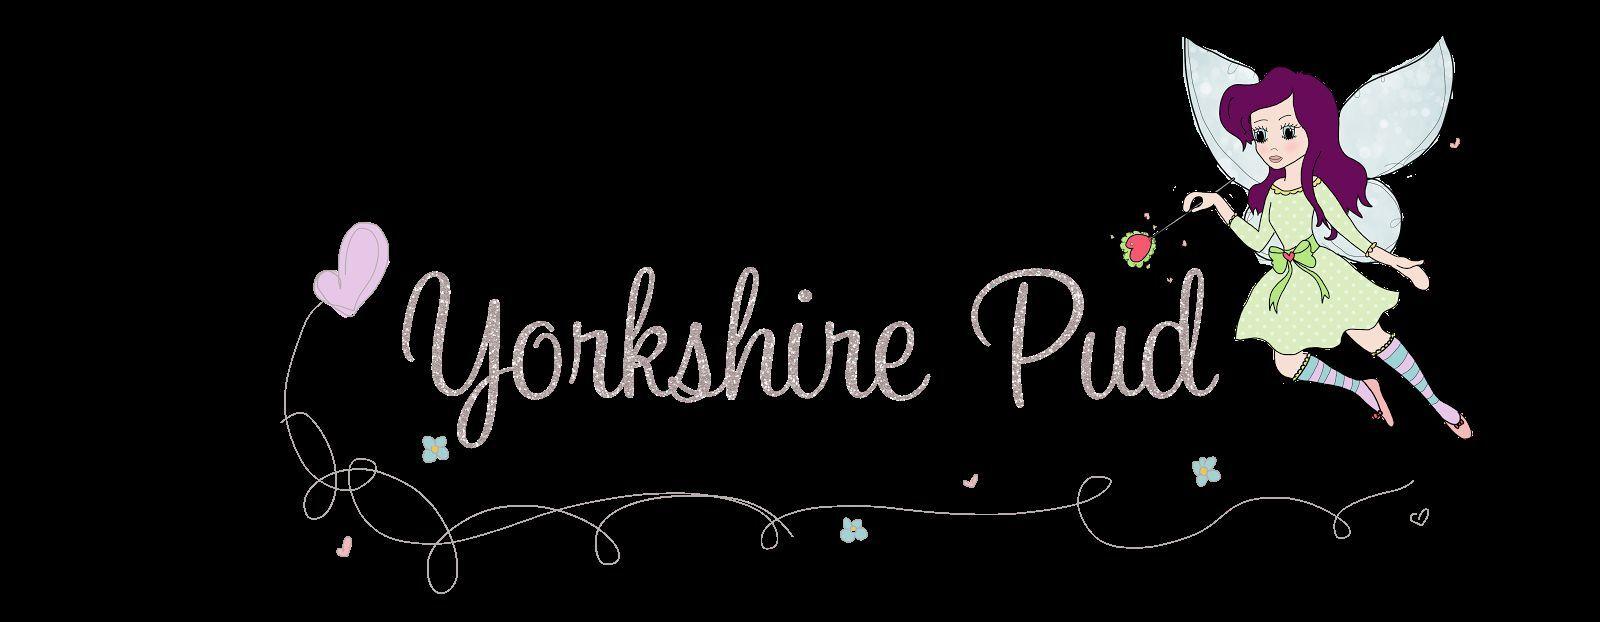 Yorkshire Pud